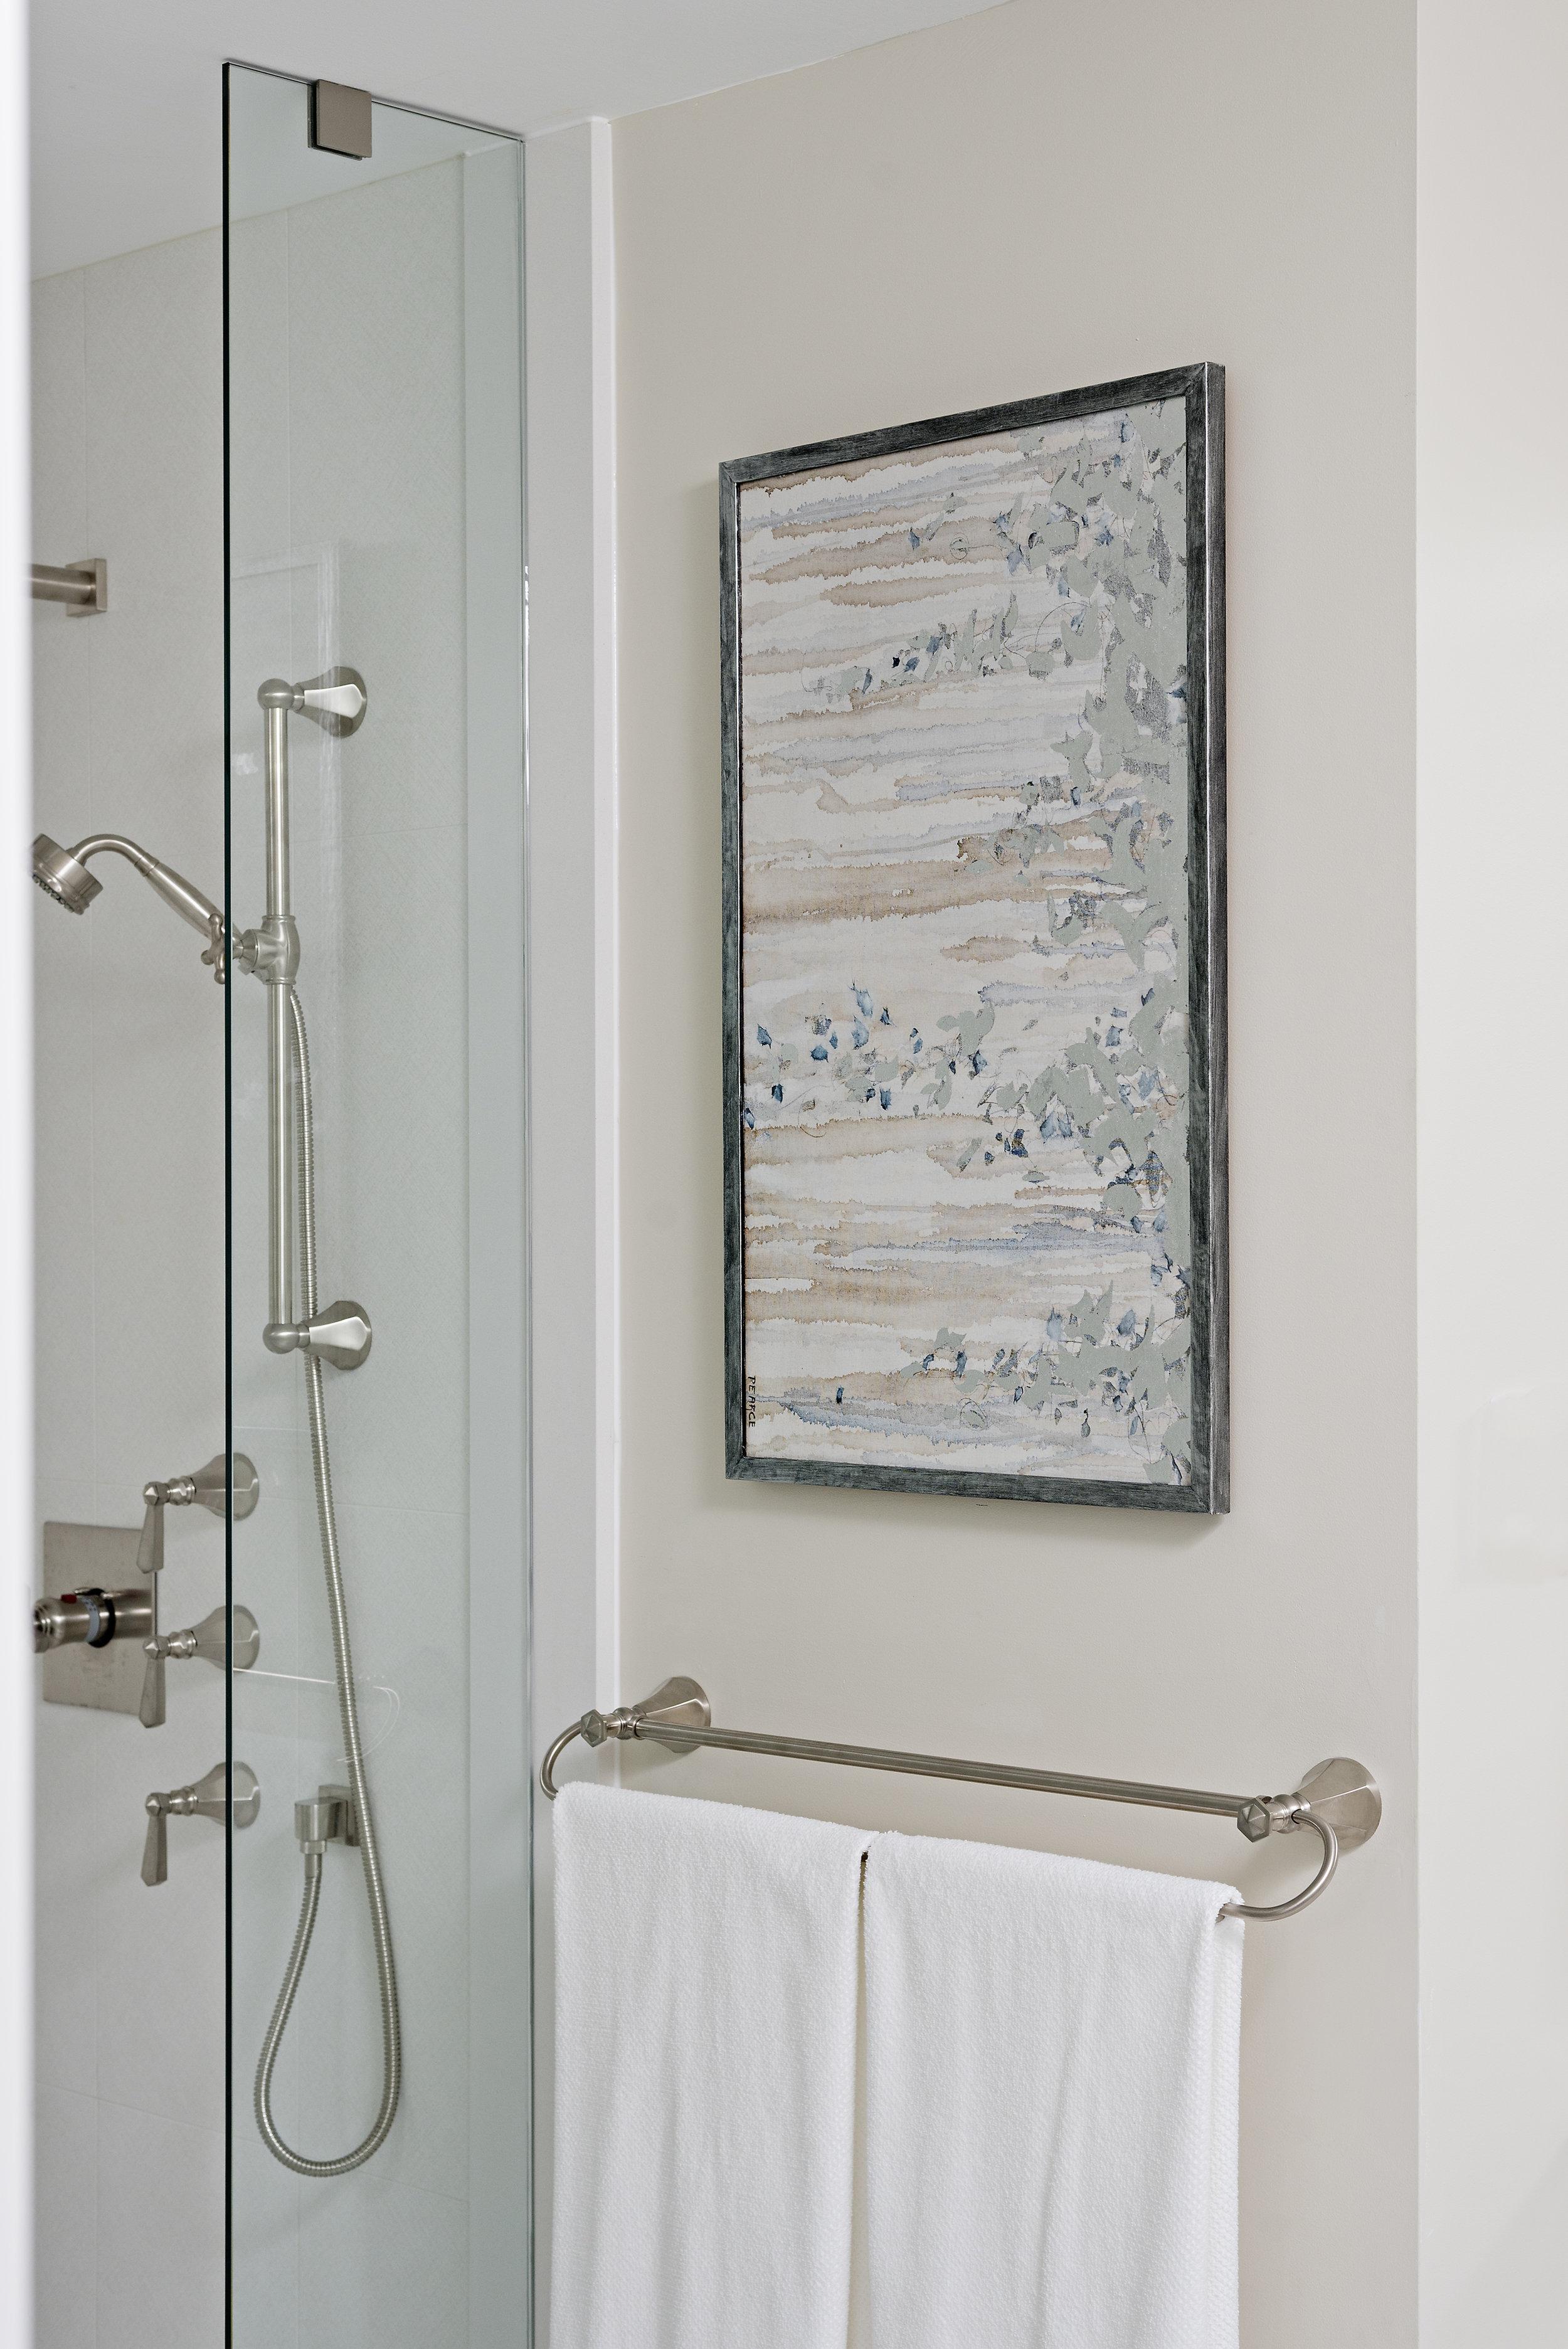 pizzale design interior design white bathroom driftwood grey picture frame water colour canvas print satin nichel towel bar glass enclosed shower.jpg